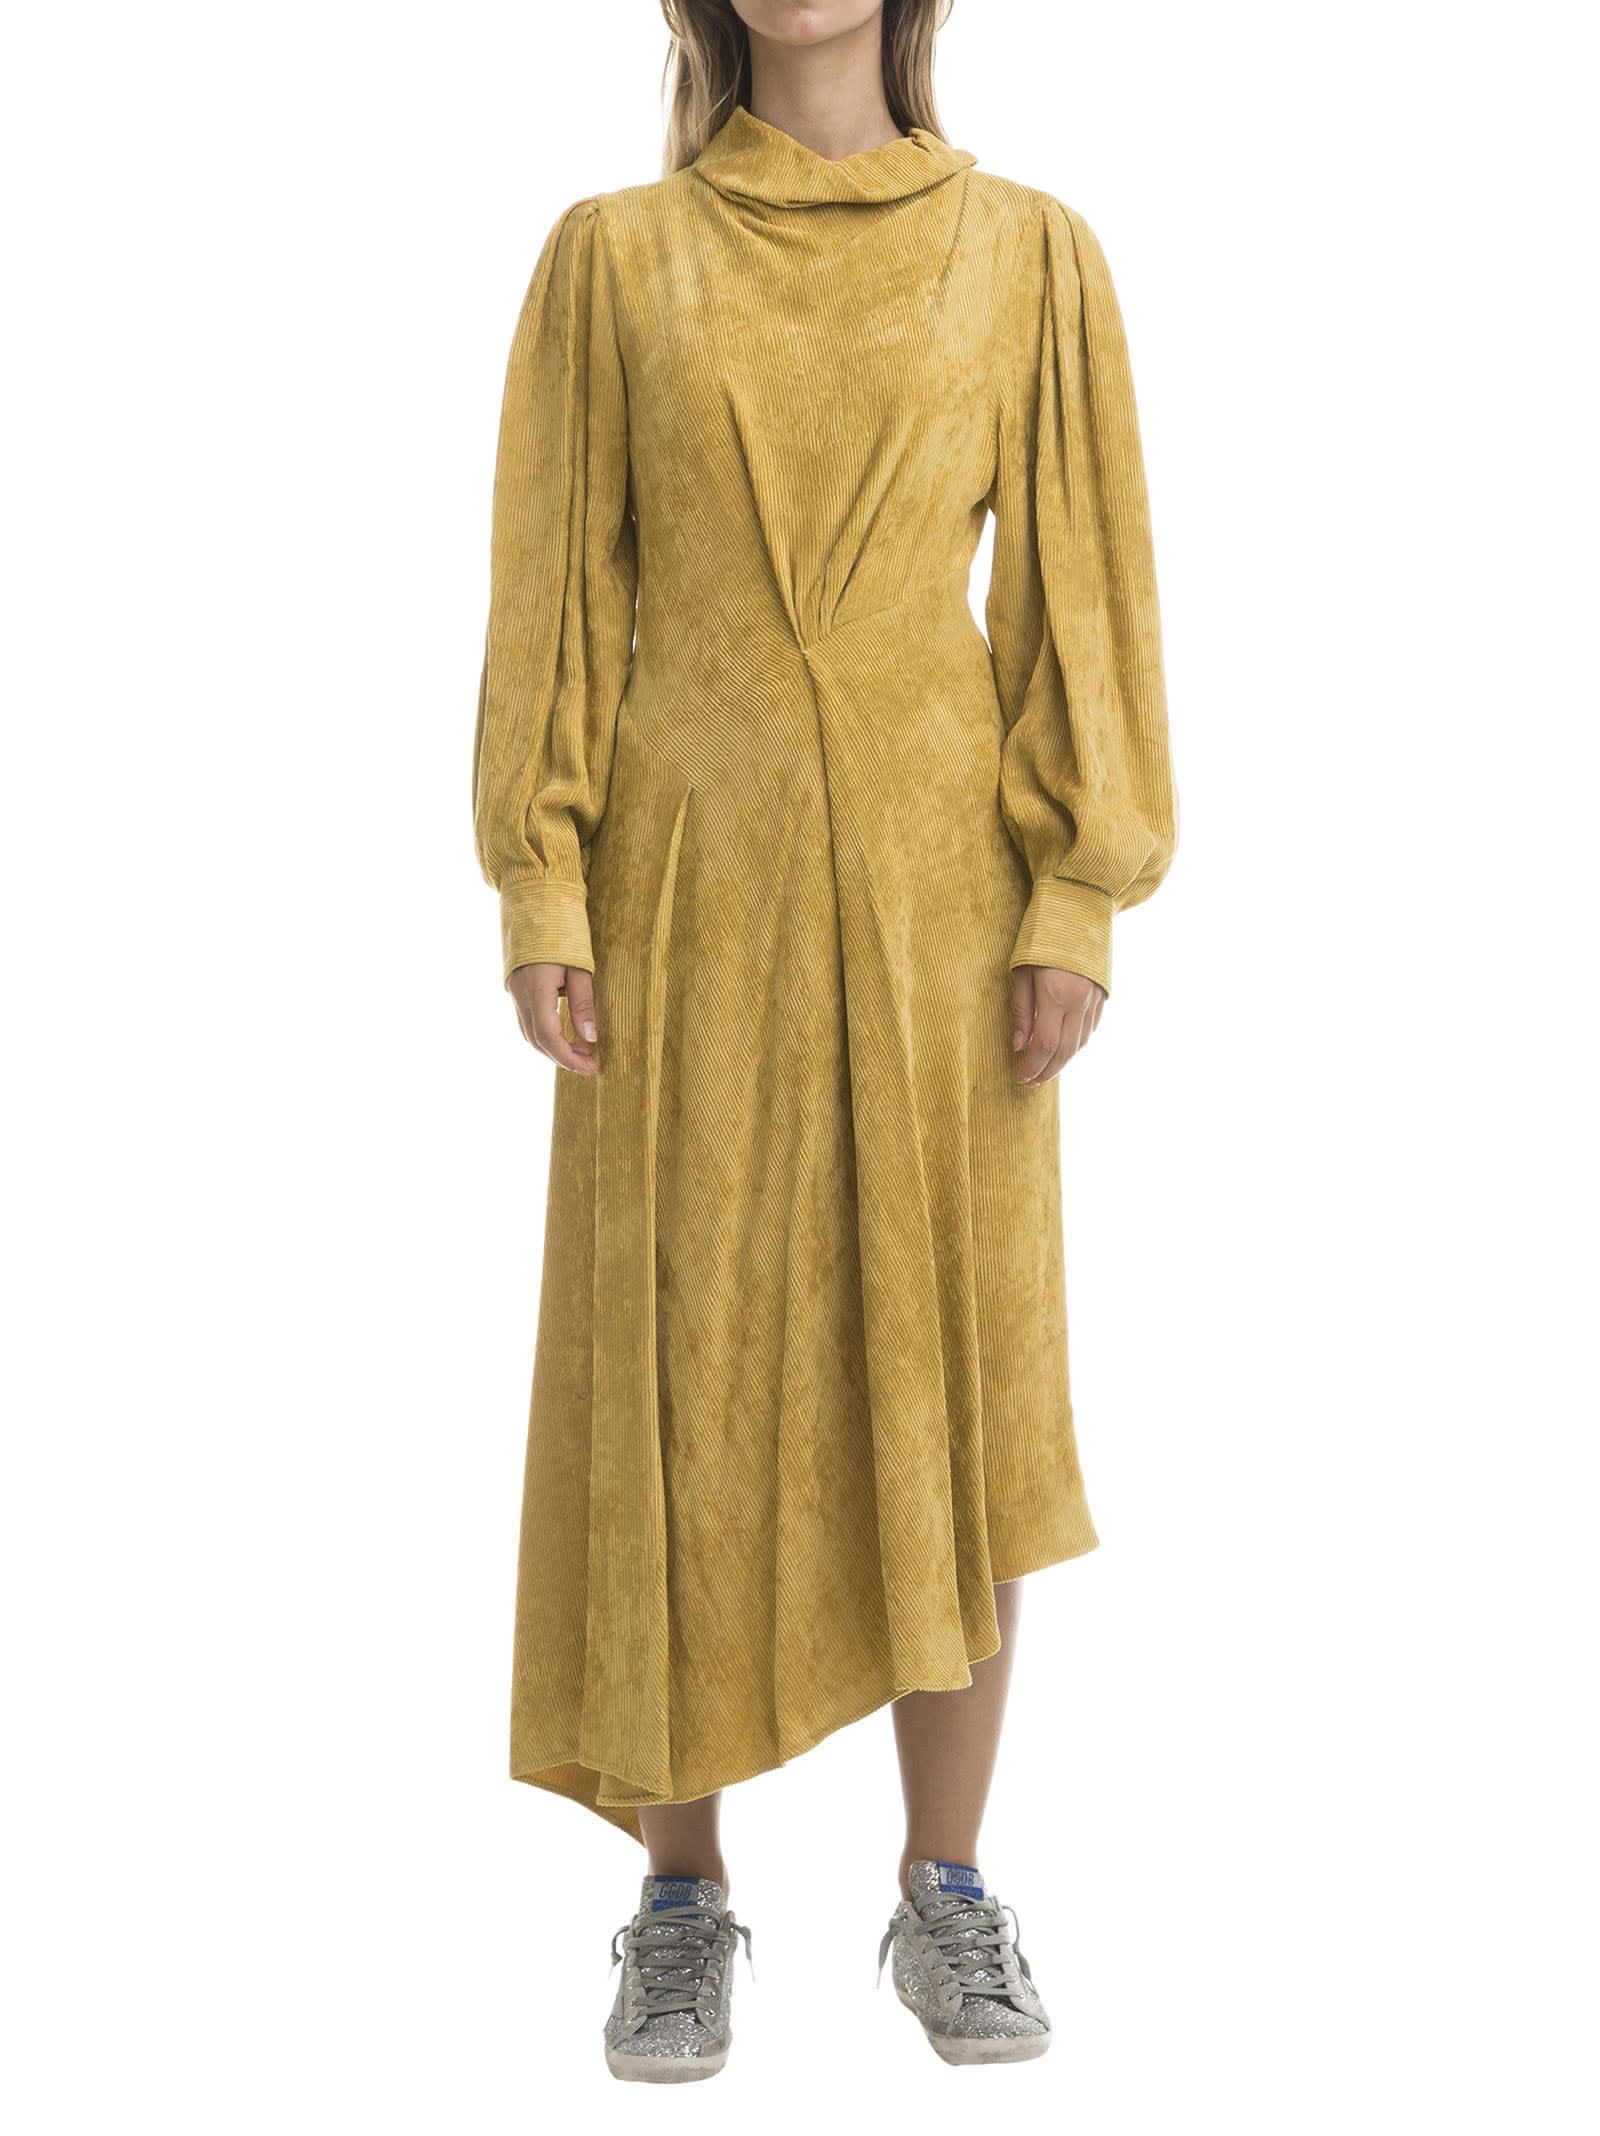 Isabel Marant Fergus Dress